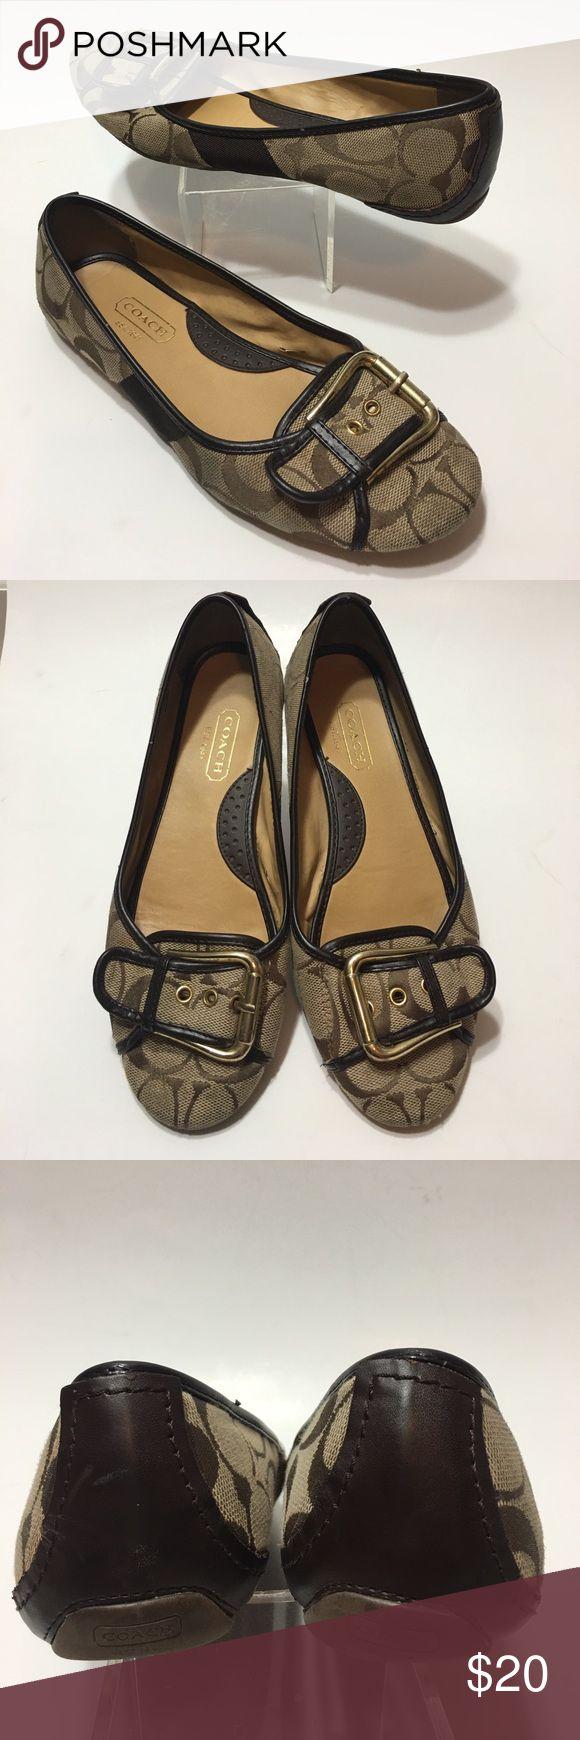 "Coach • ""Josie"" Flats • Sz 9 Coach flats • Style: Josie • Gold hardware • Signature jacquard ""C"" symbol pattern • Minor wear to outside fabric Coach Shoes Flats & Loafers"